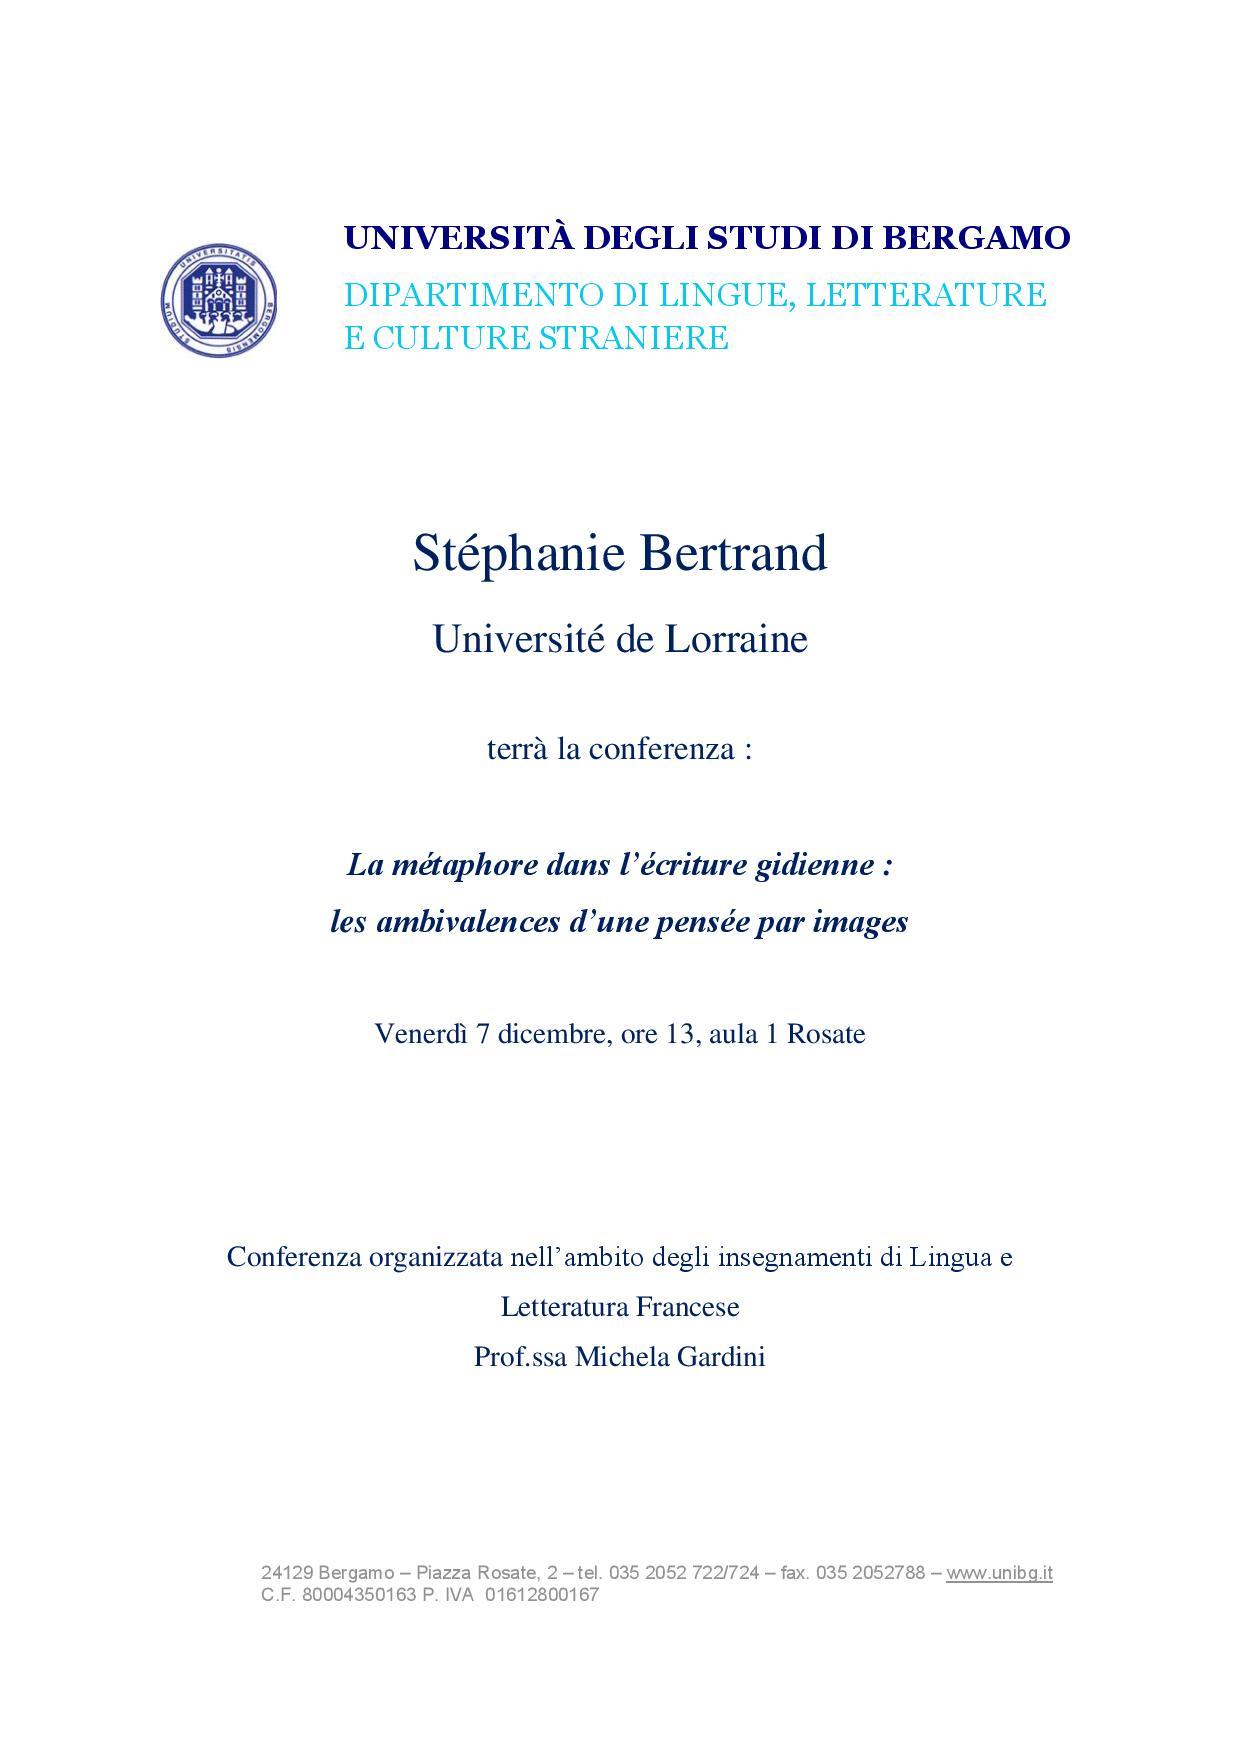 Locandina Stphanie Bertrand page 001